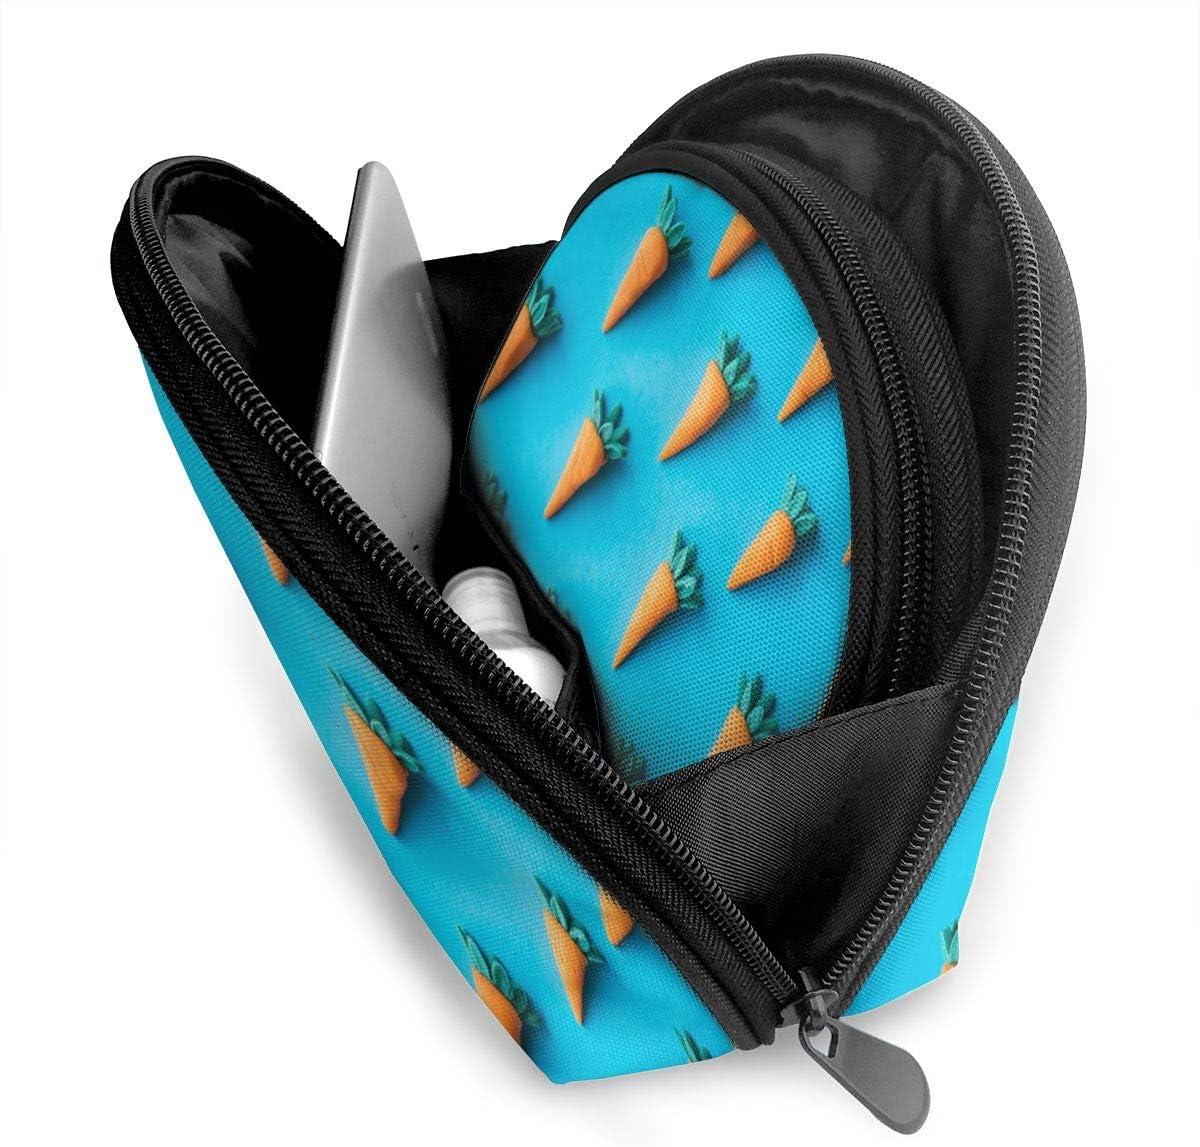 Bafrsc Personalized Carrot Plush Toys Womens Shell Shape Storage Bag Organizer Bag Gift 2Pcs